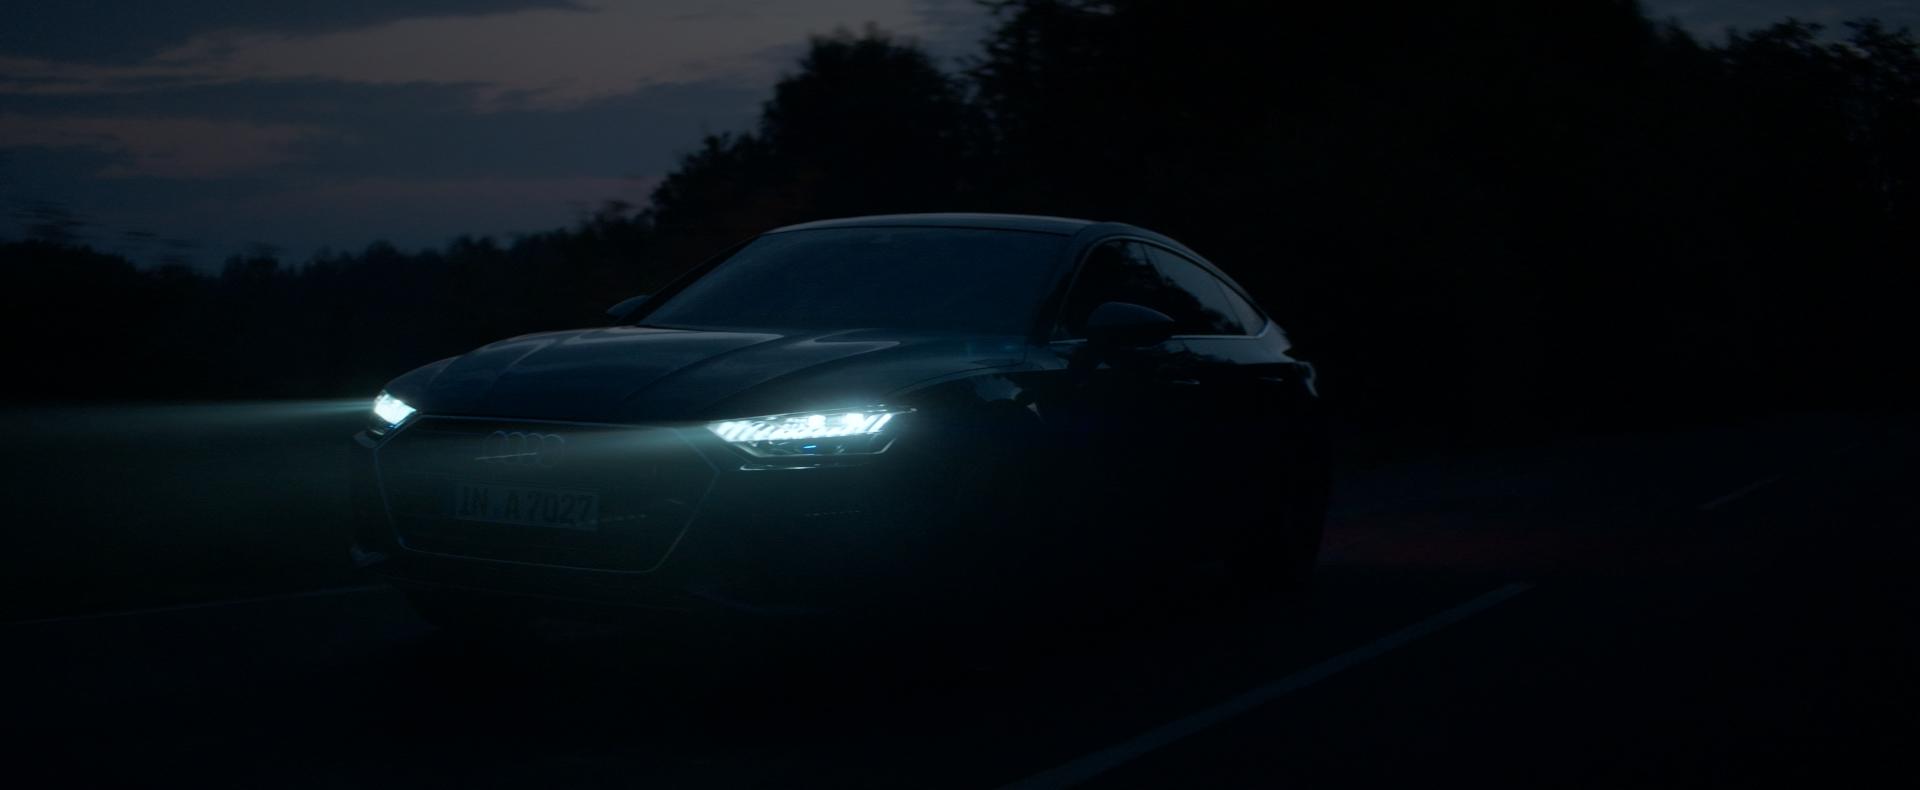 Audi A7_1.1.14.jpg